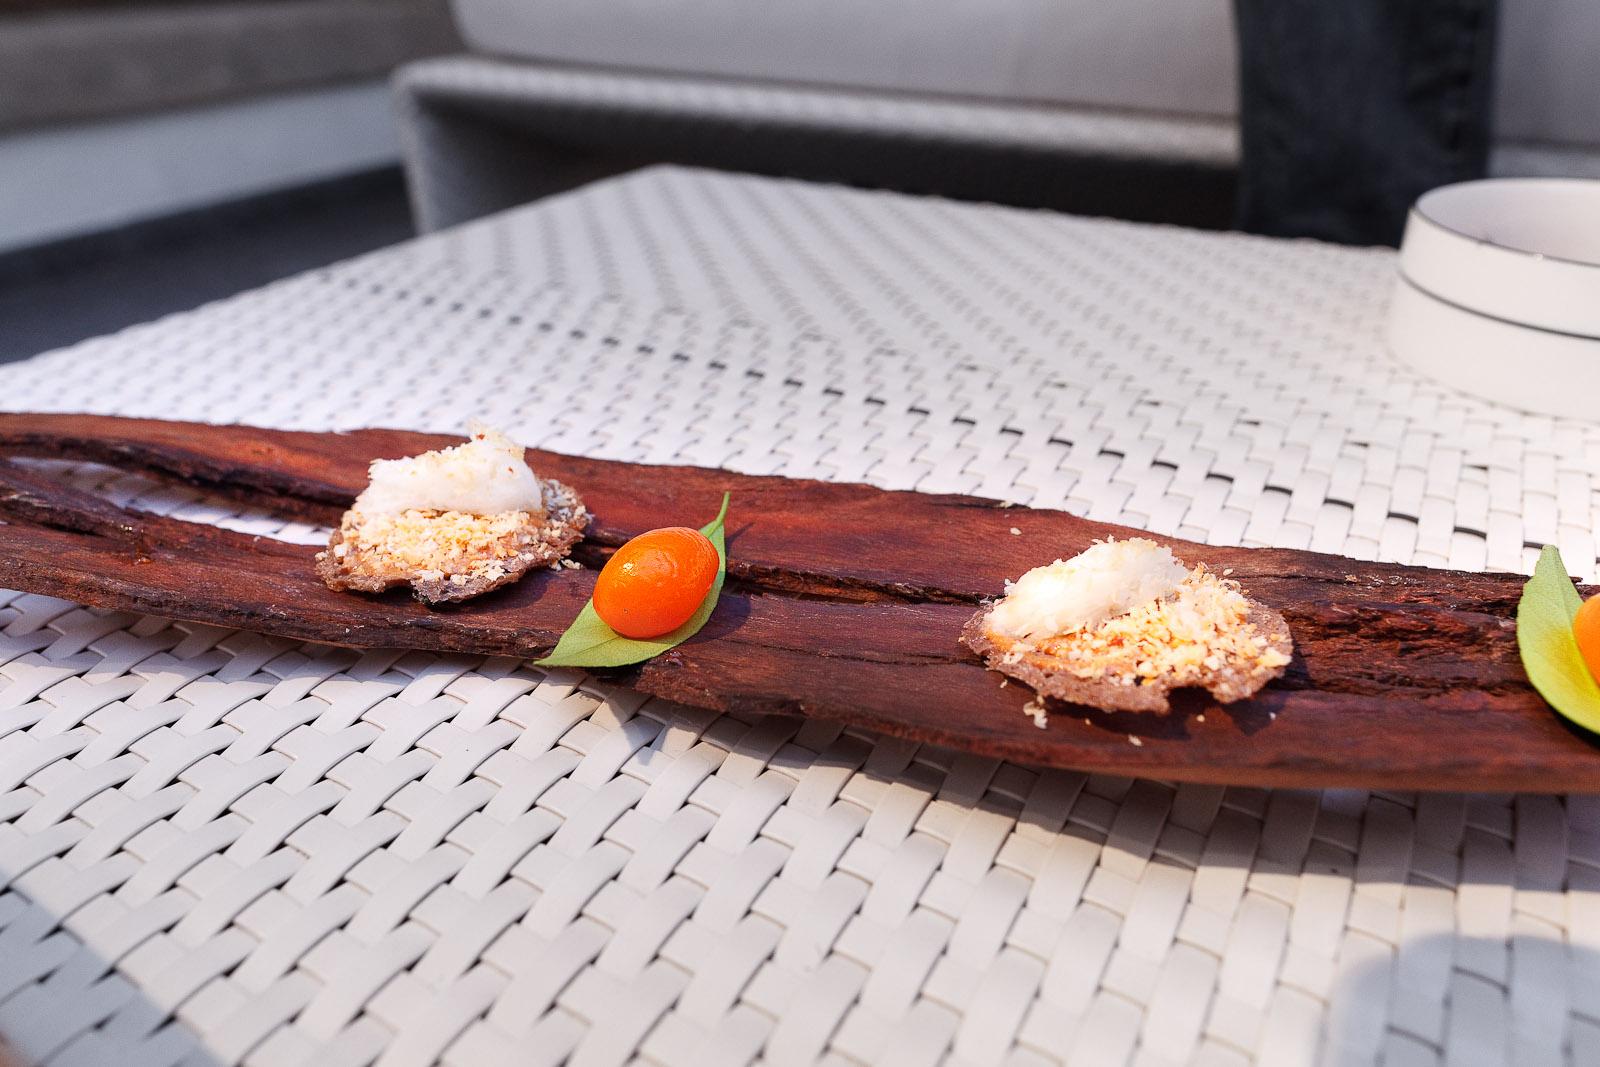 Amuse bouche: Kumquat filled with flying fish eggs